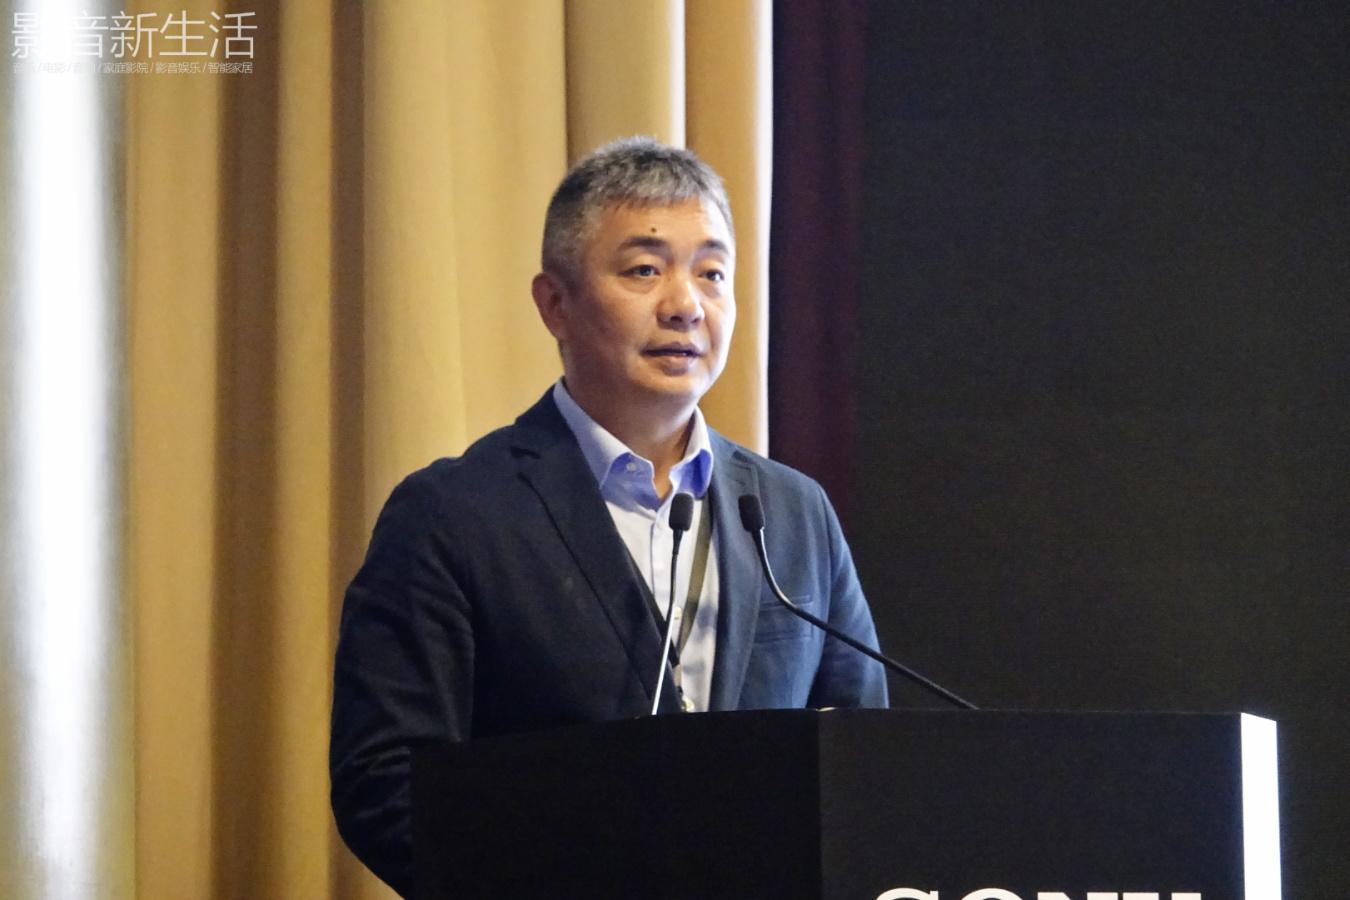 "Sony Hi Res 2018 17 - 新品 | ""重塑随身音乐娱乐王朝!"":Sony索尼发布Signature醇音系列新兄弟IER-Z1R和DMP-Z1,以及舞台监听耳机系列:IER-M7和IER-M9,还有升级款MDR-Z7M2!"